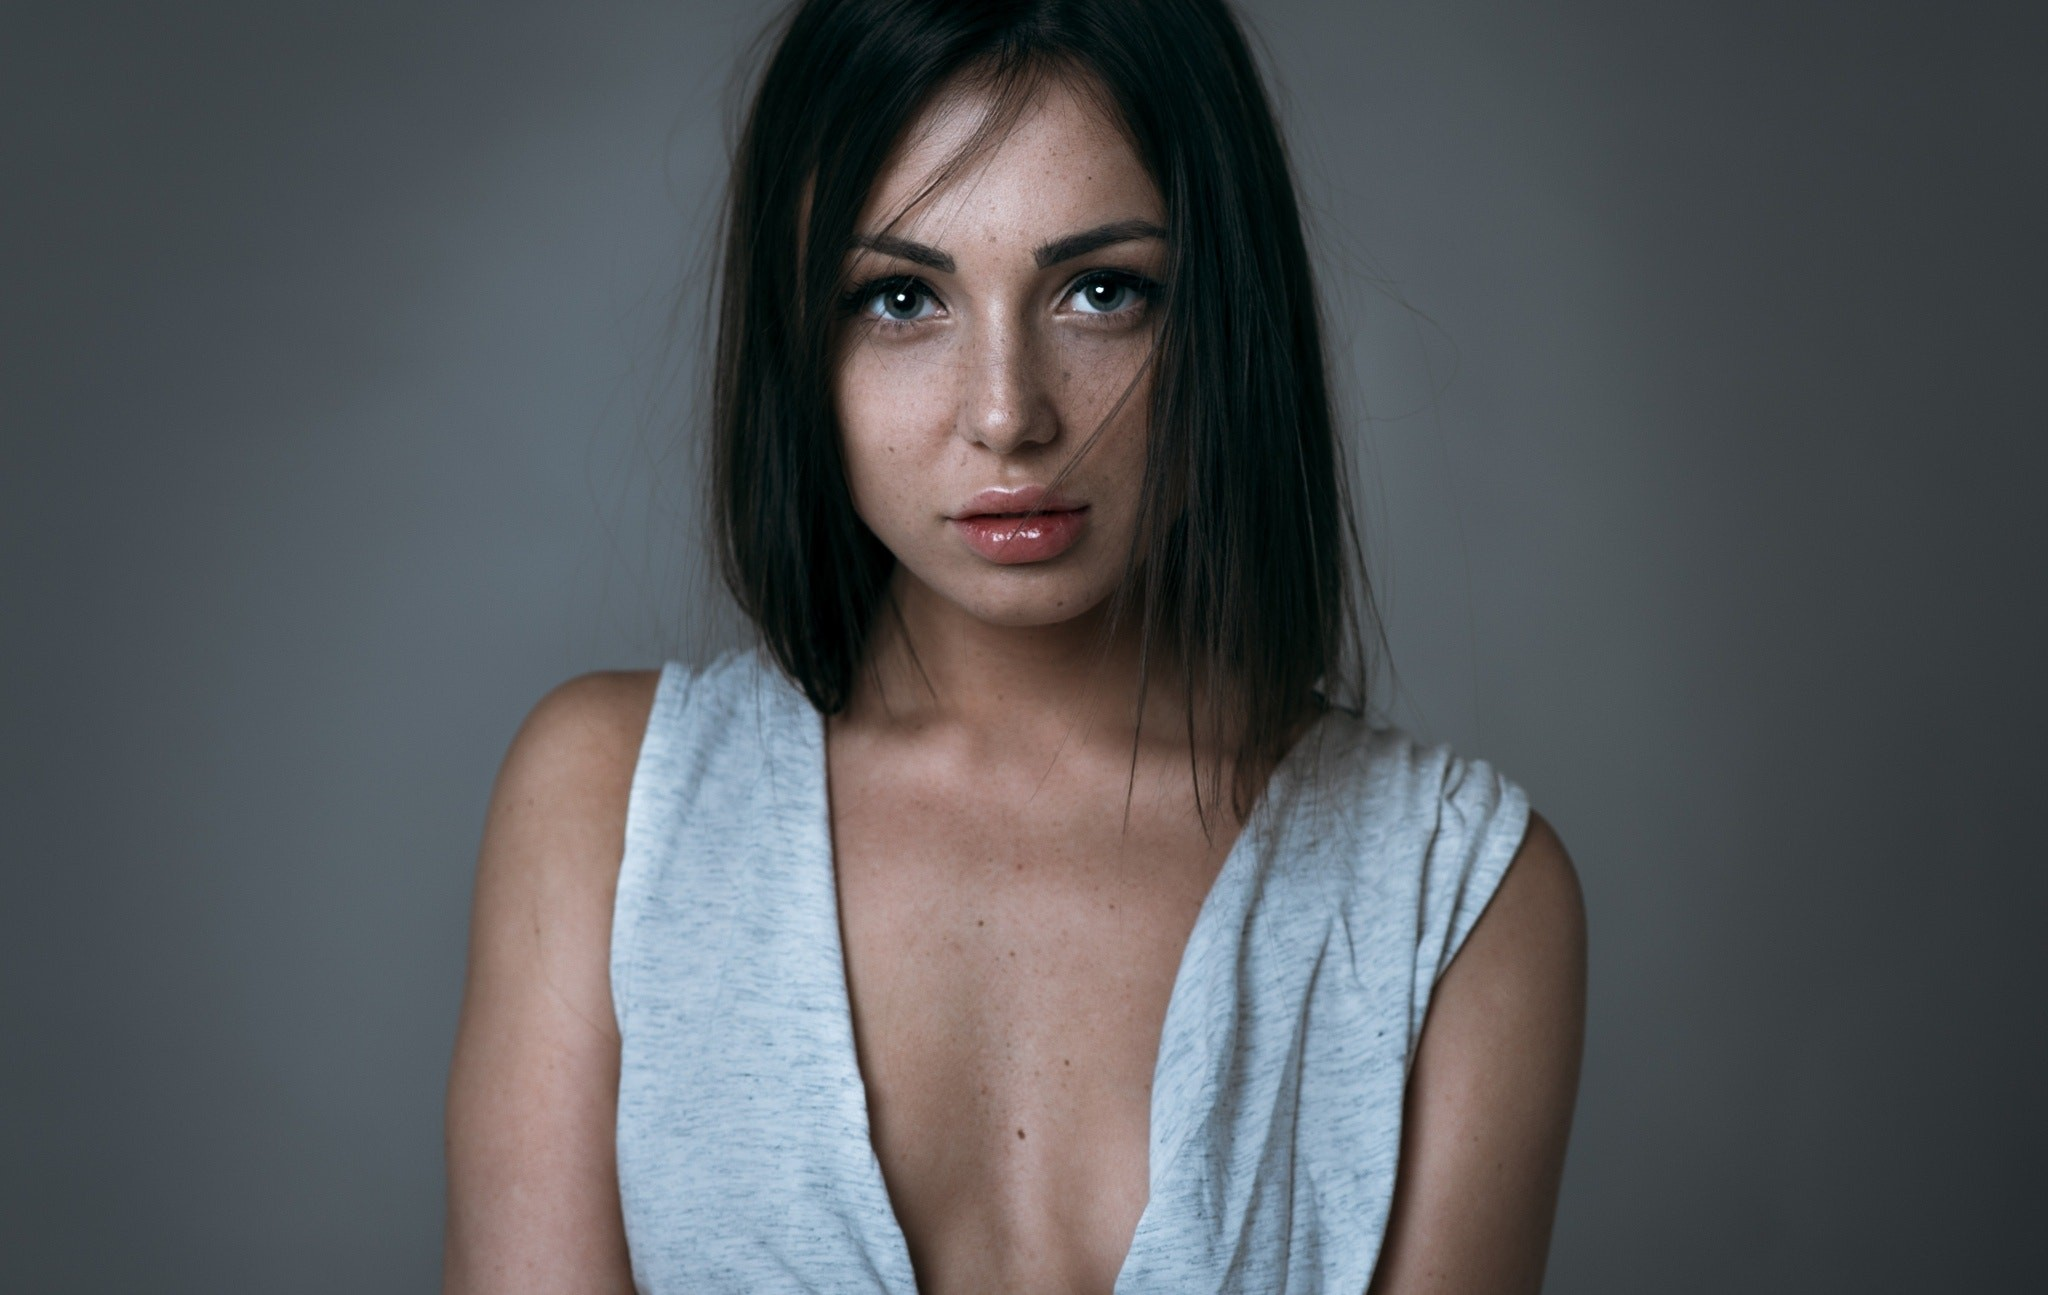 Foxy Di, freckles, pornstar, submission, Medina U, face